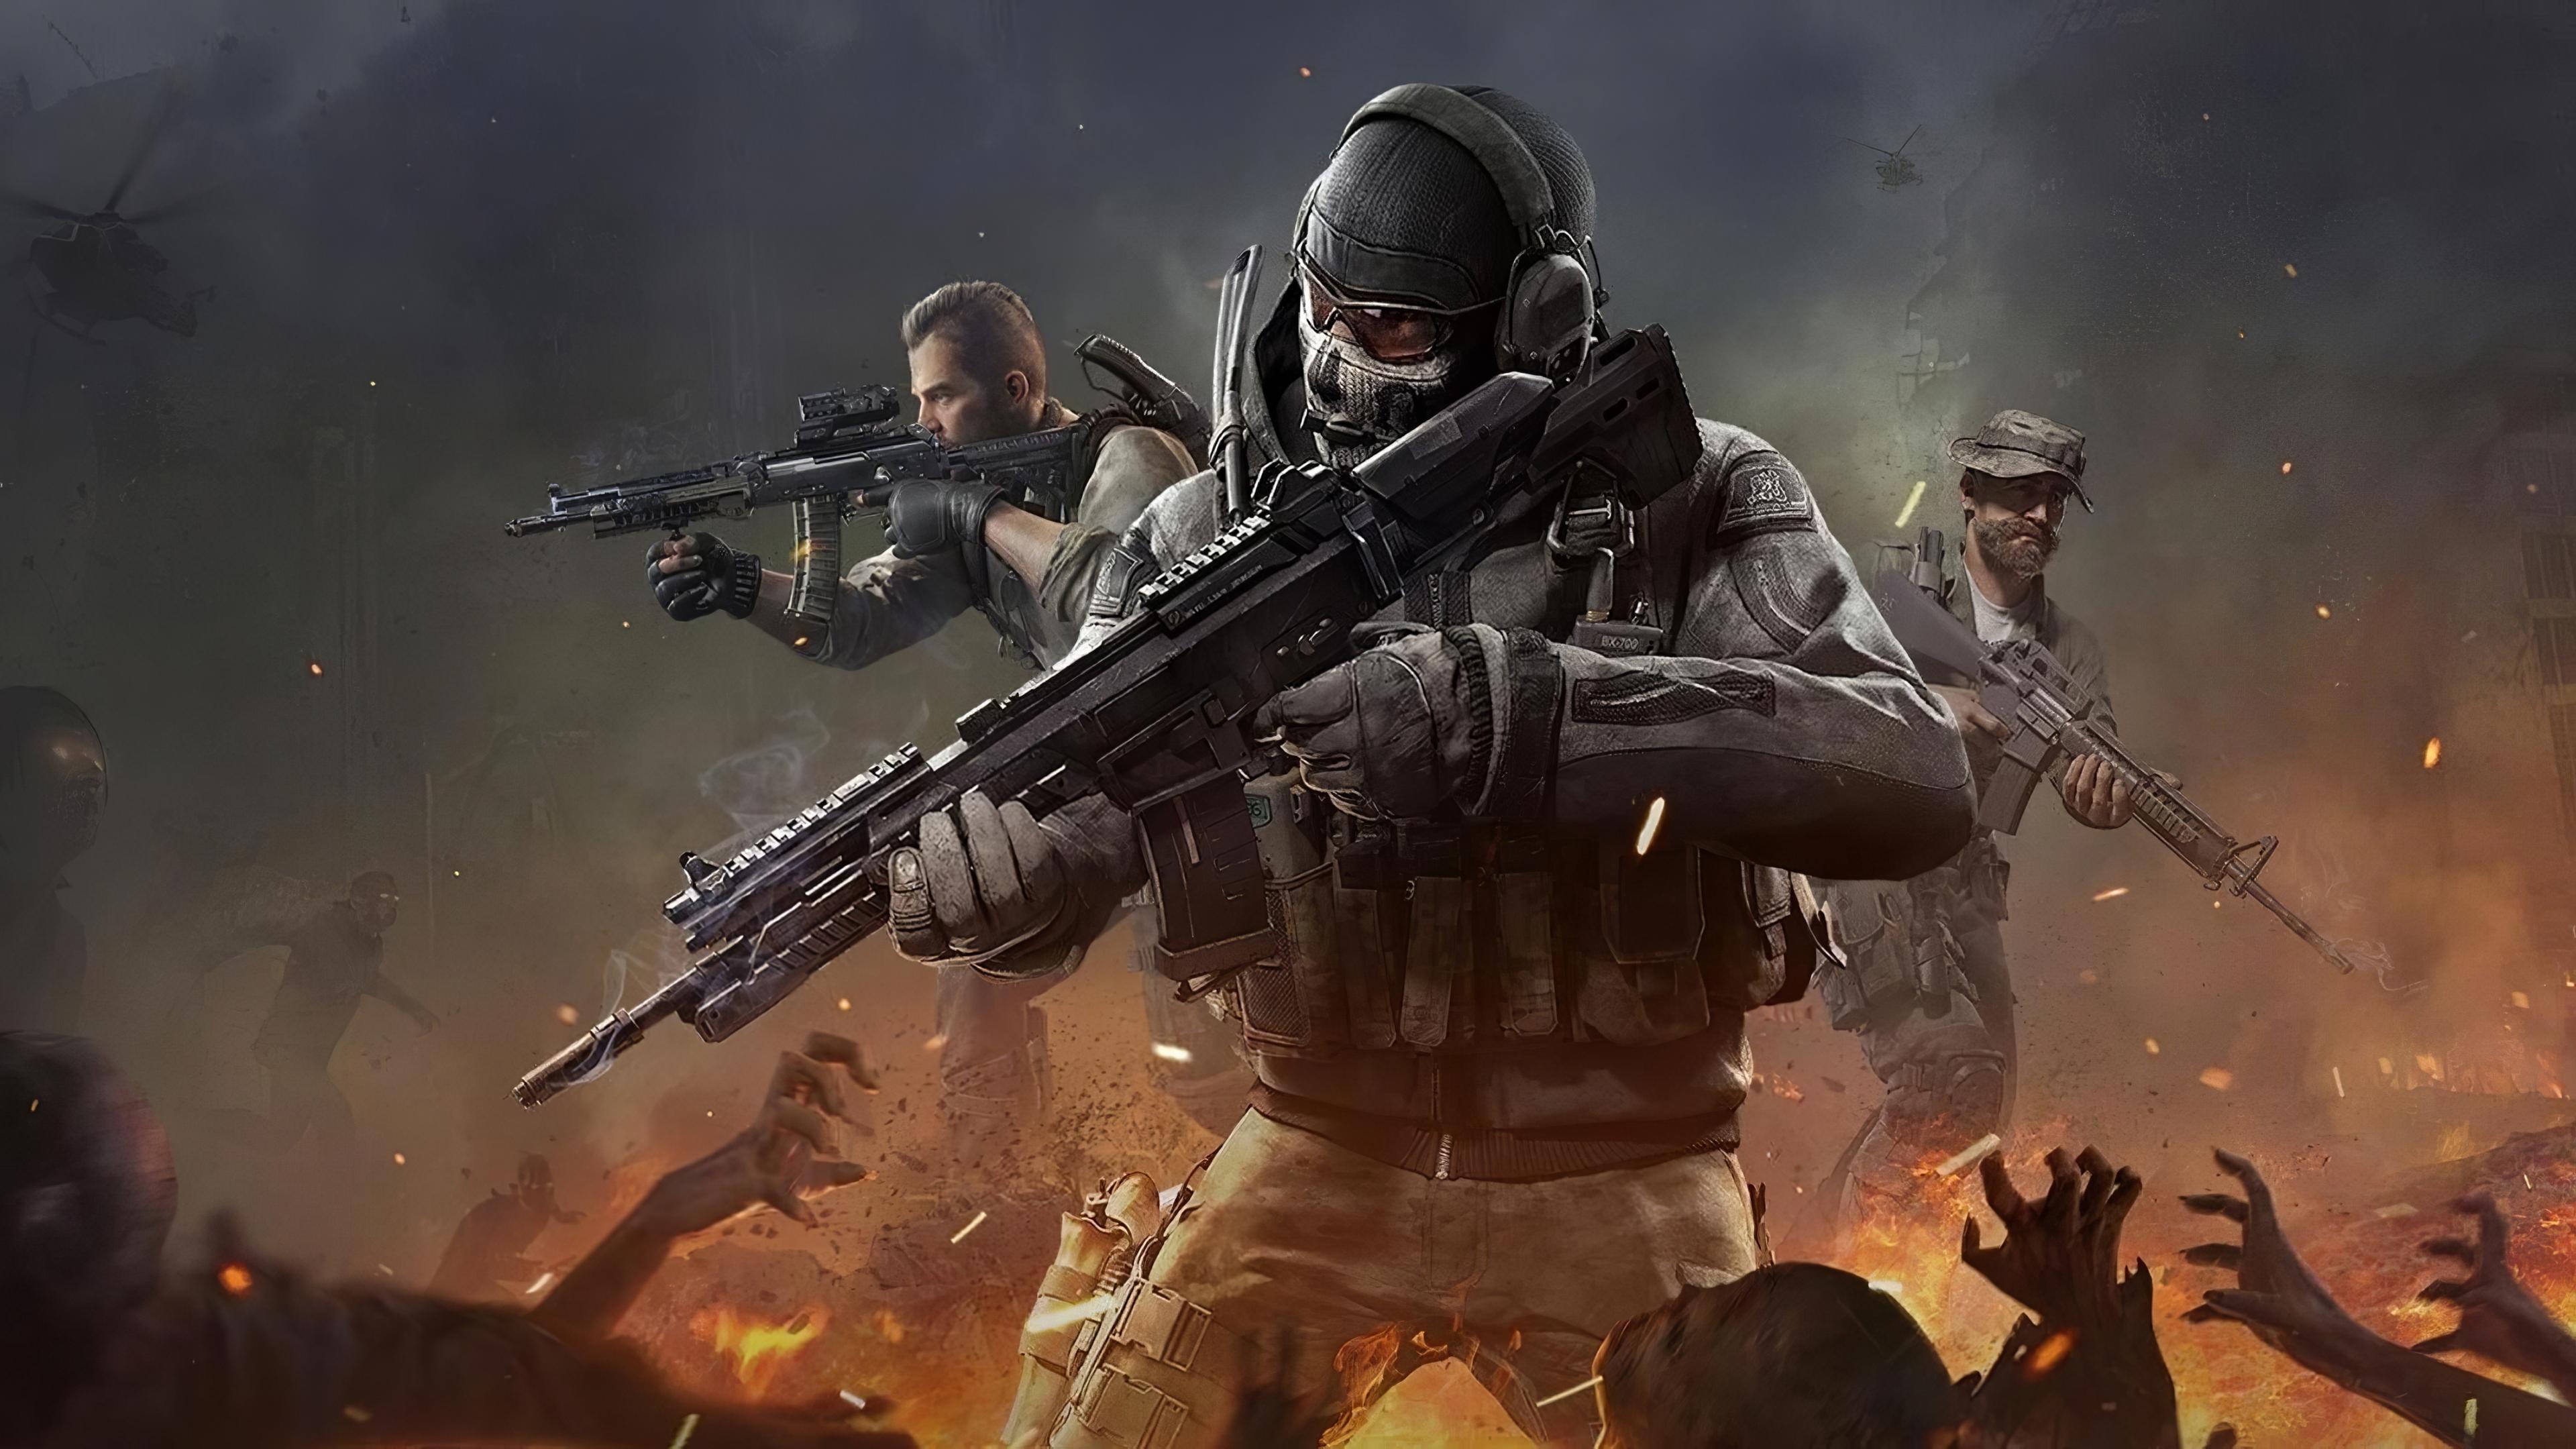 3840x2160 Call Of Duty Mobile 4k Game 2019 4k HD 4k ...